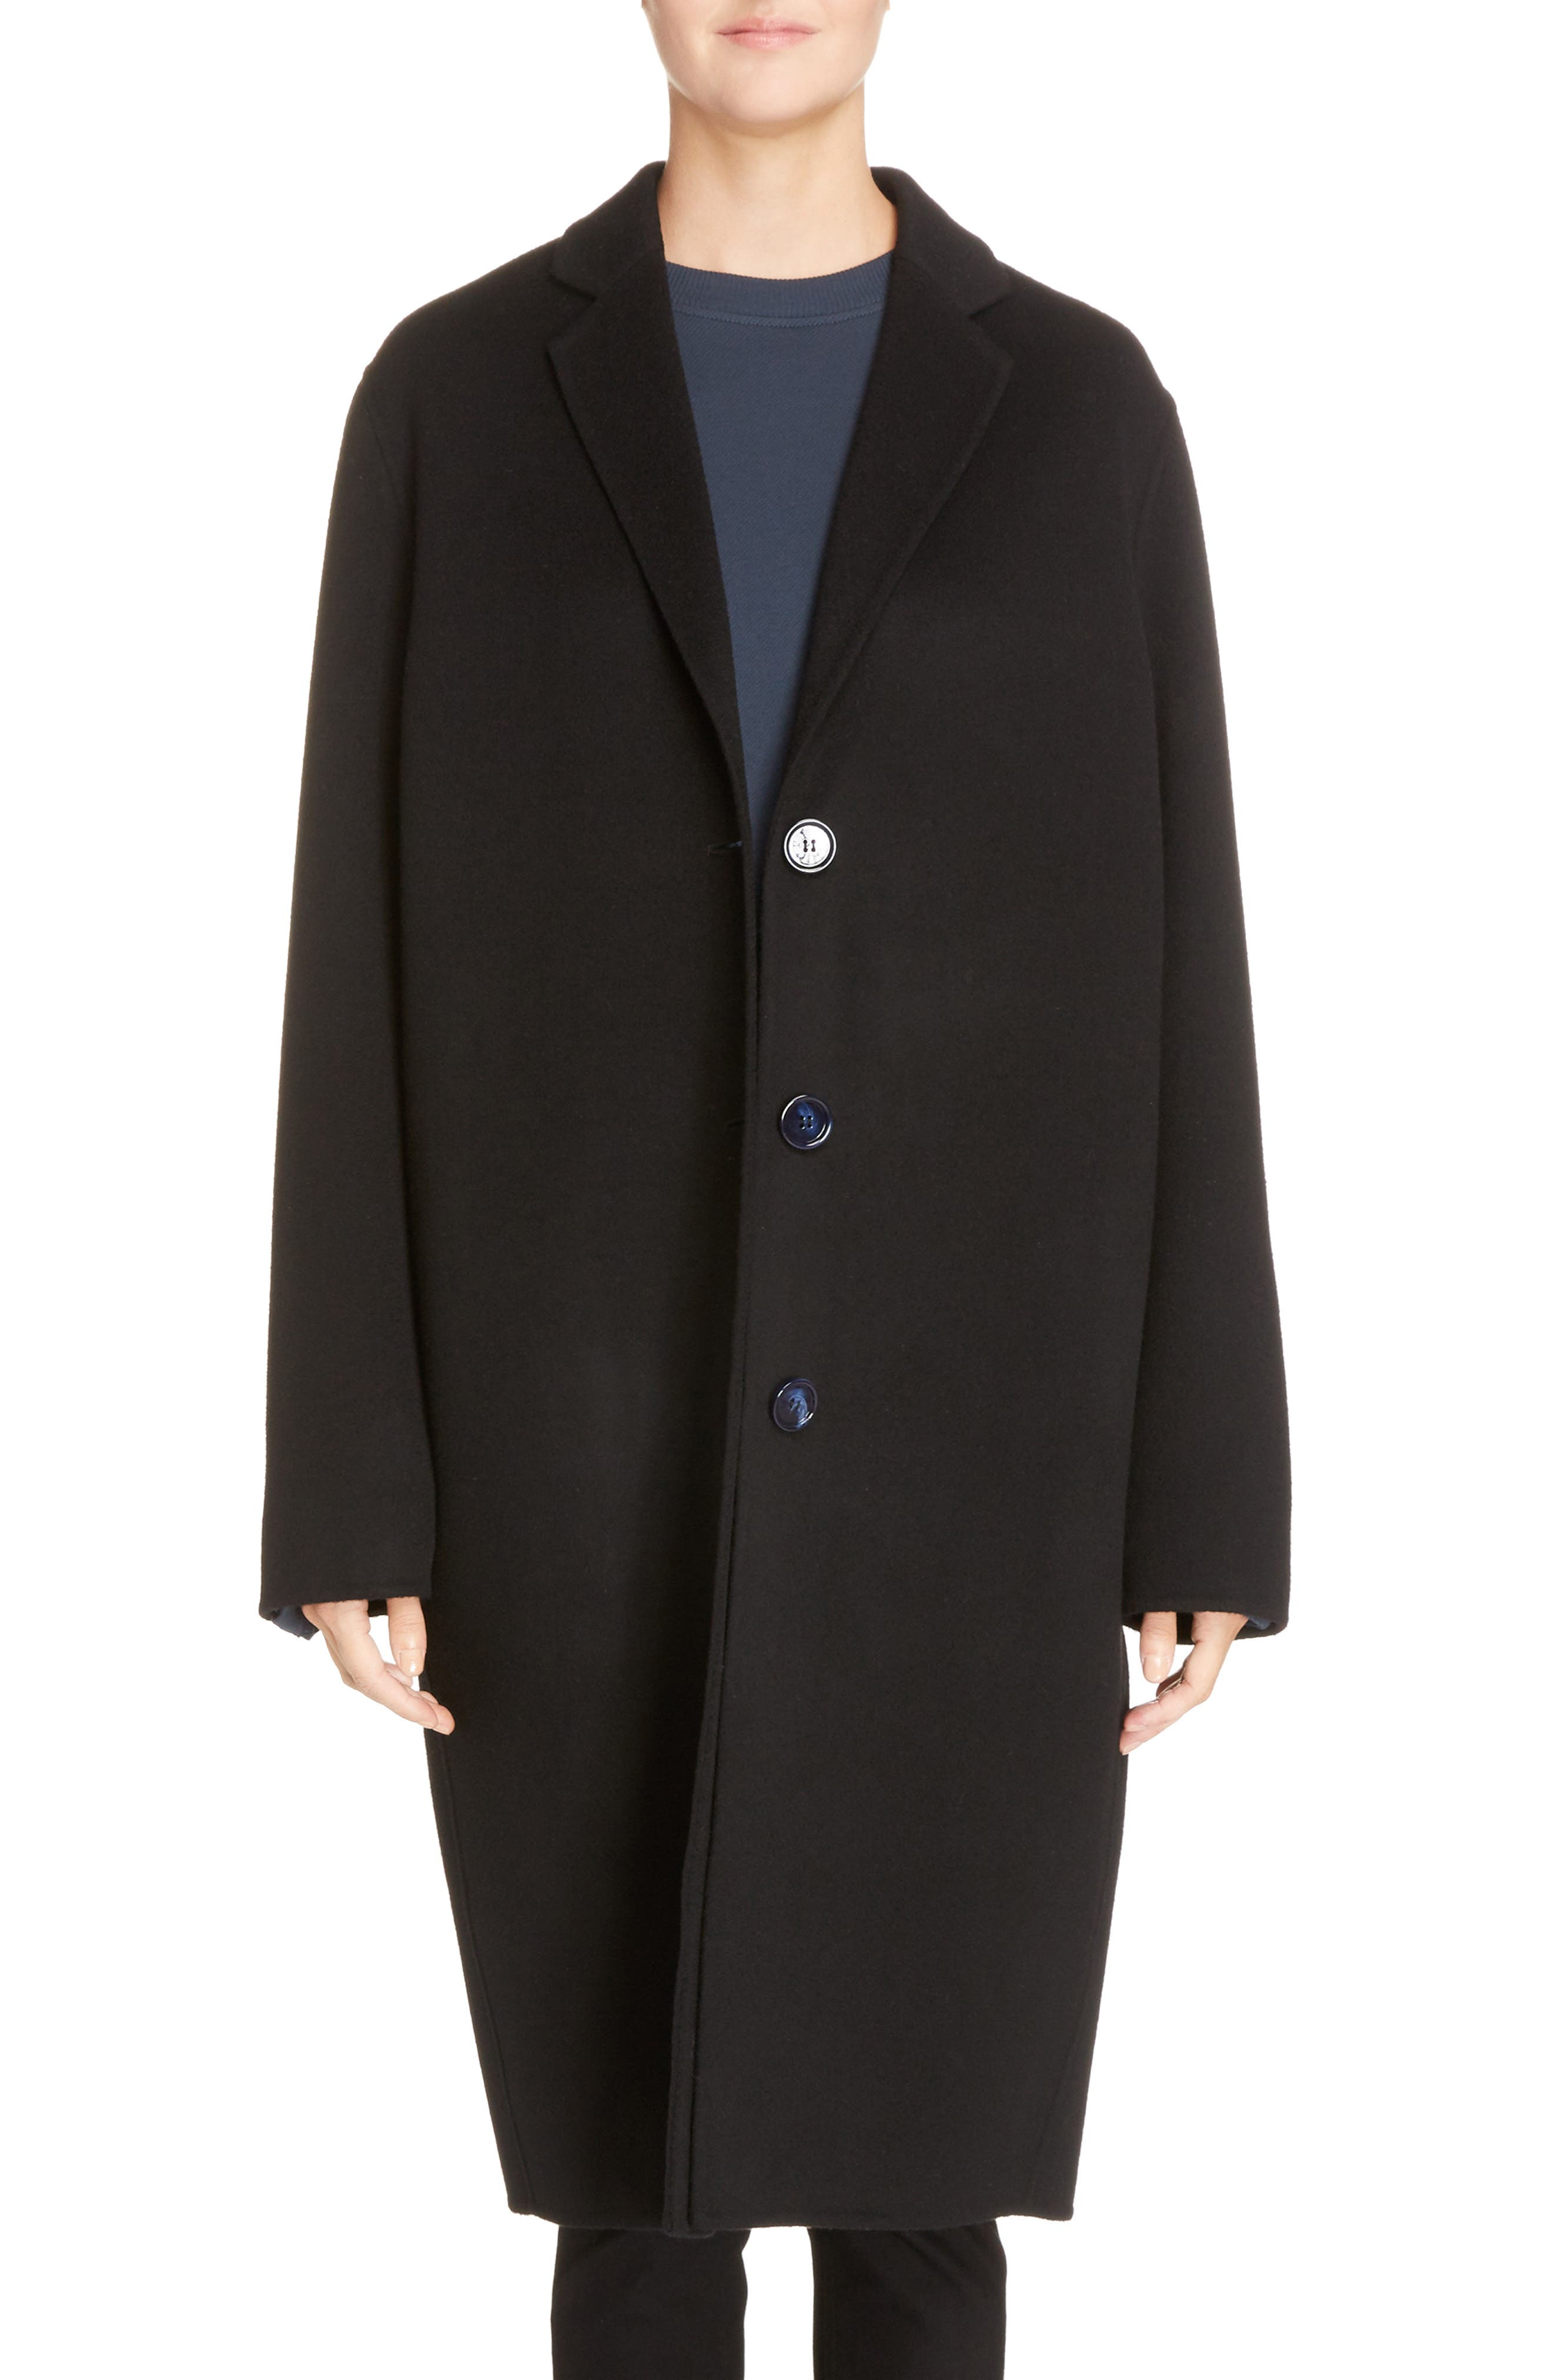 Avalon Wool & Cashmere Coat,                         Main,                         color, BLACK